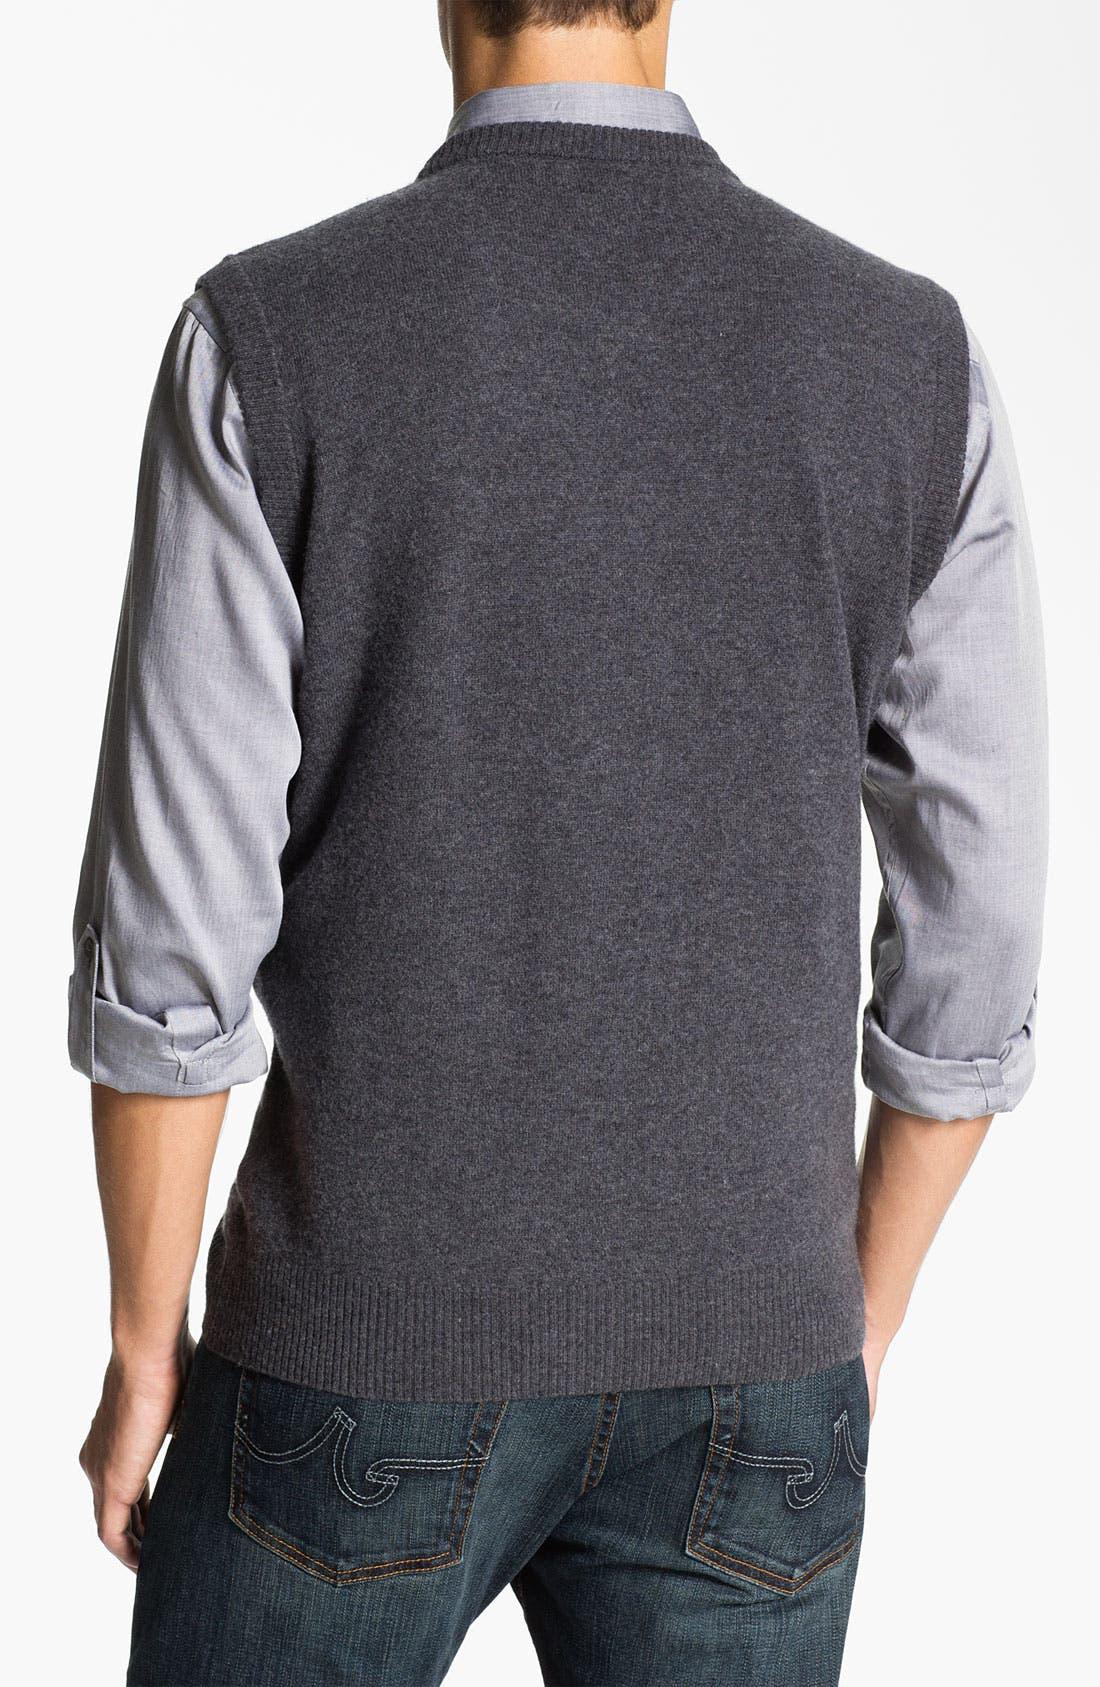 Alternate Image 2  - Franco Danti V-Neck Wool Sweater Vest